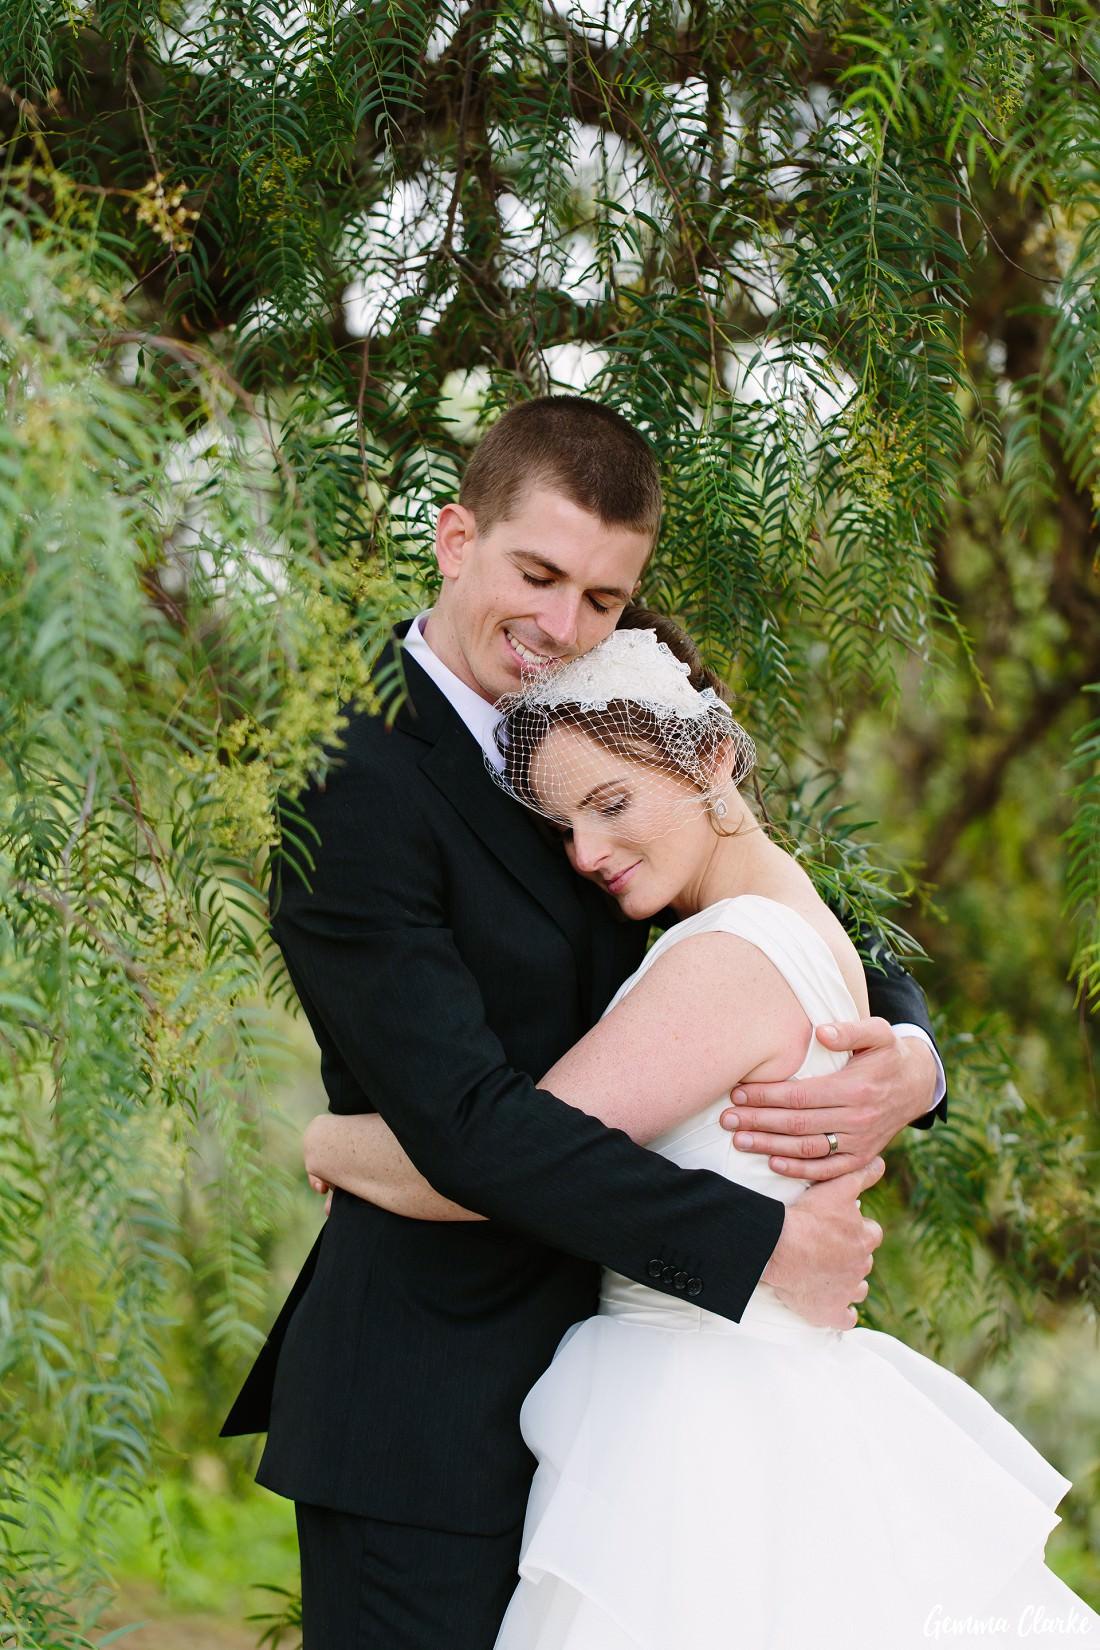 peppertree-ridge-wedding_razorback_gemma-clarke-photography-0060